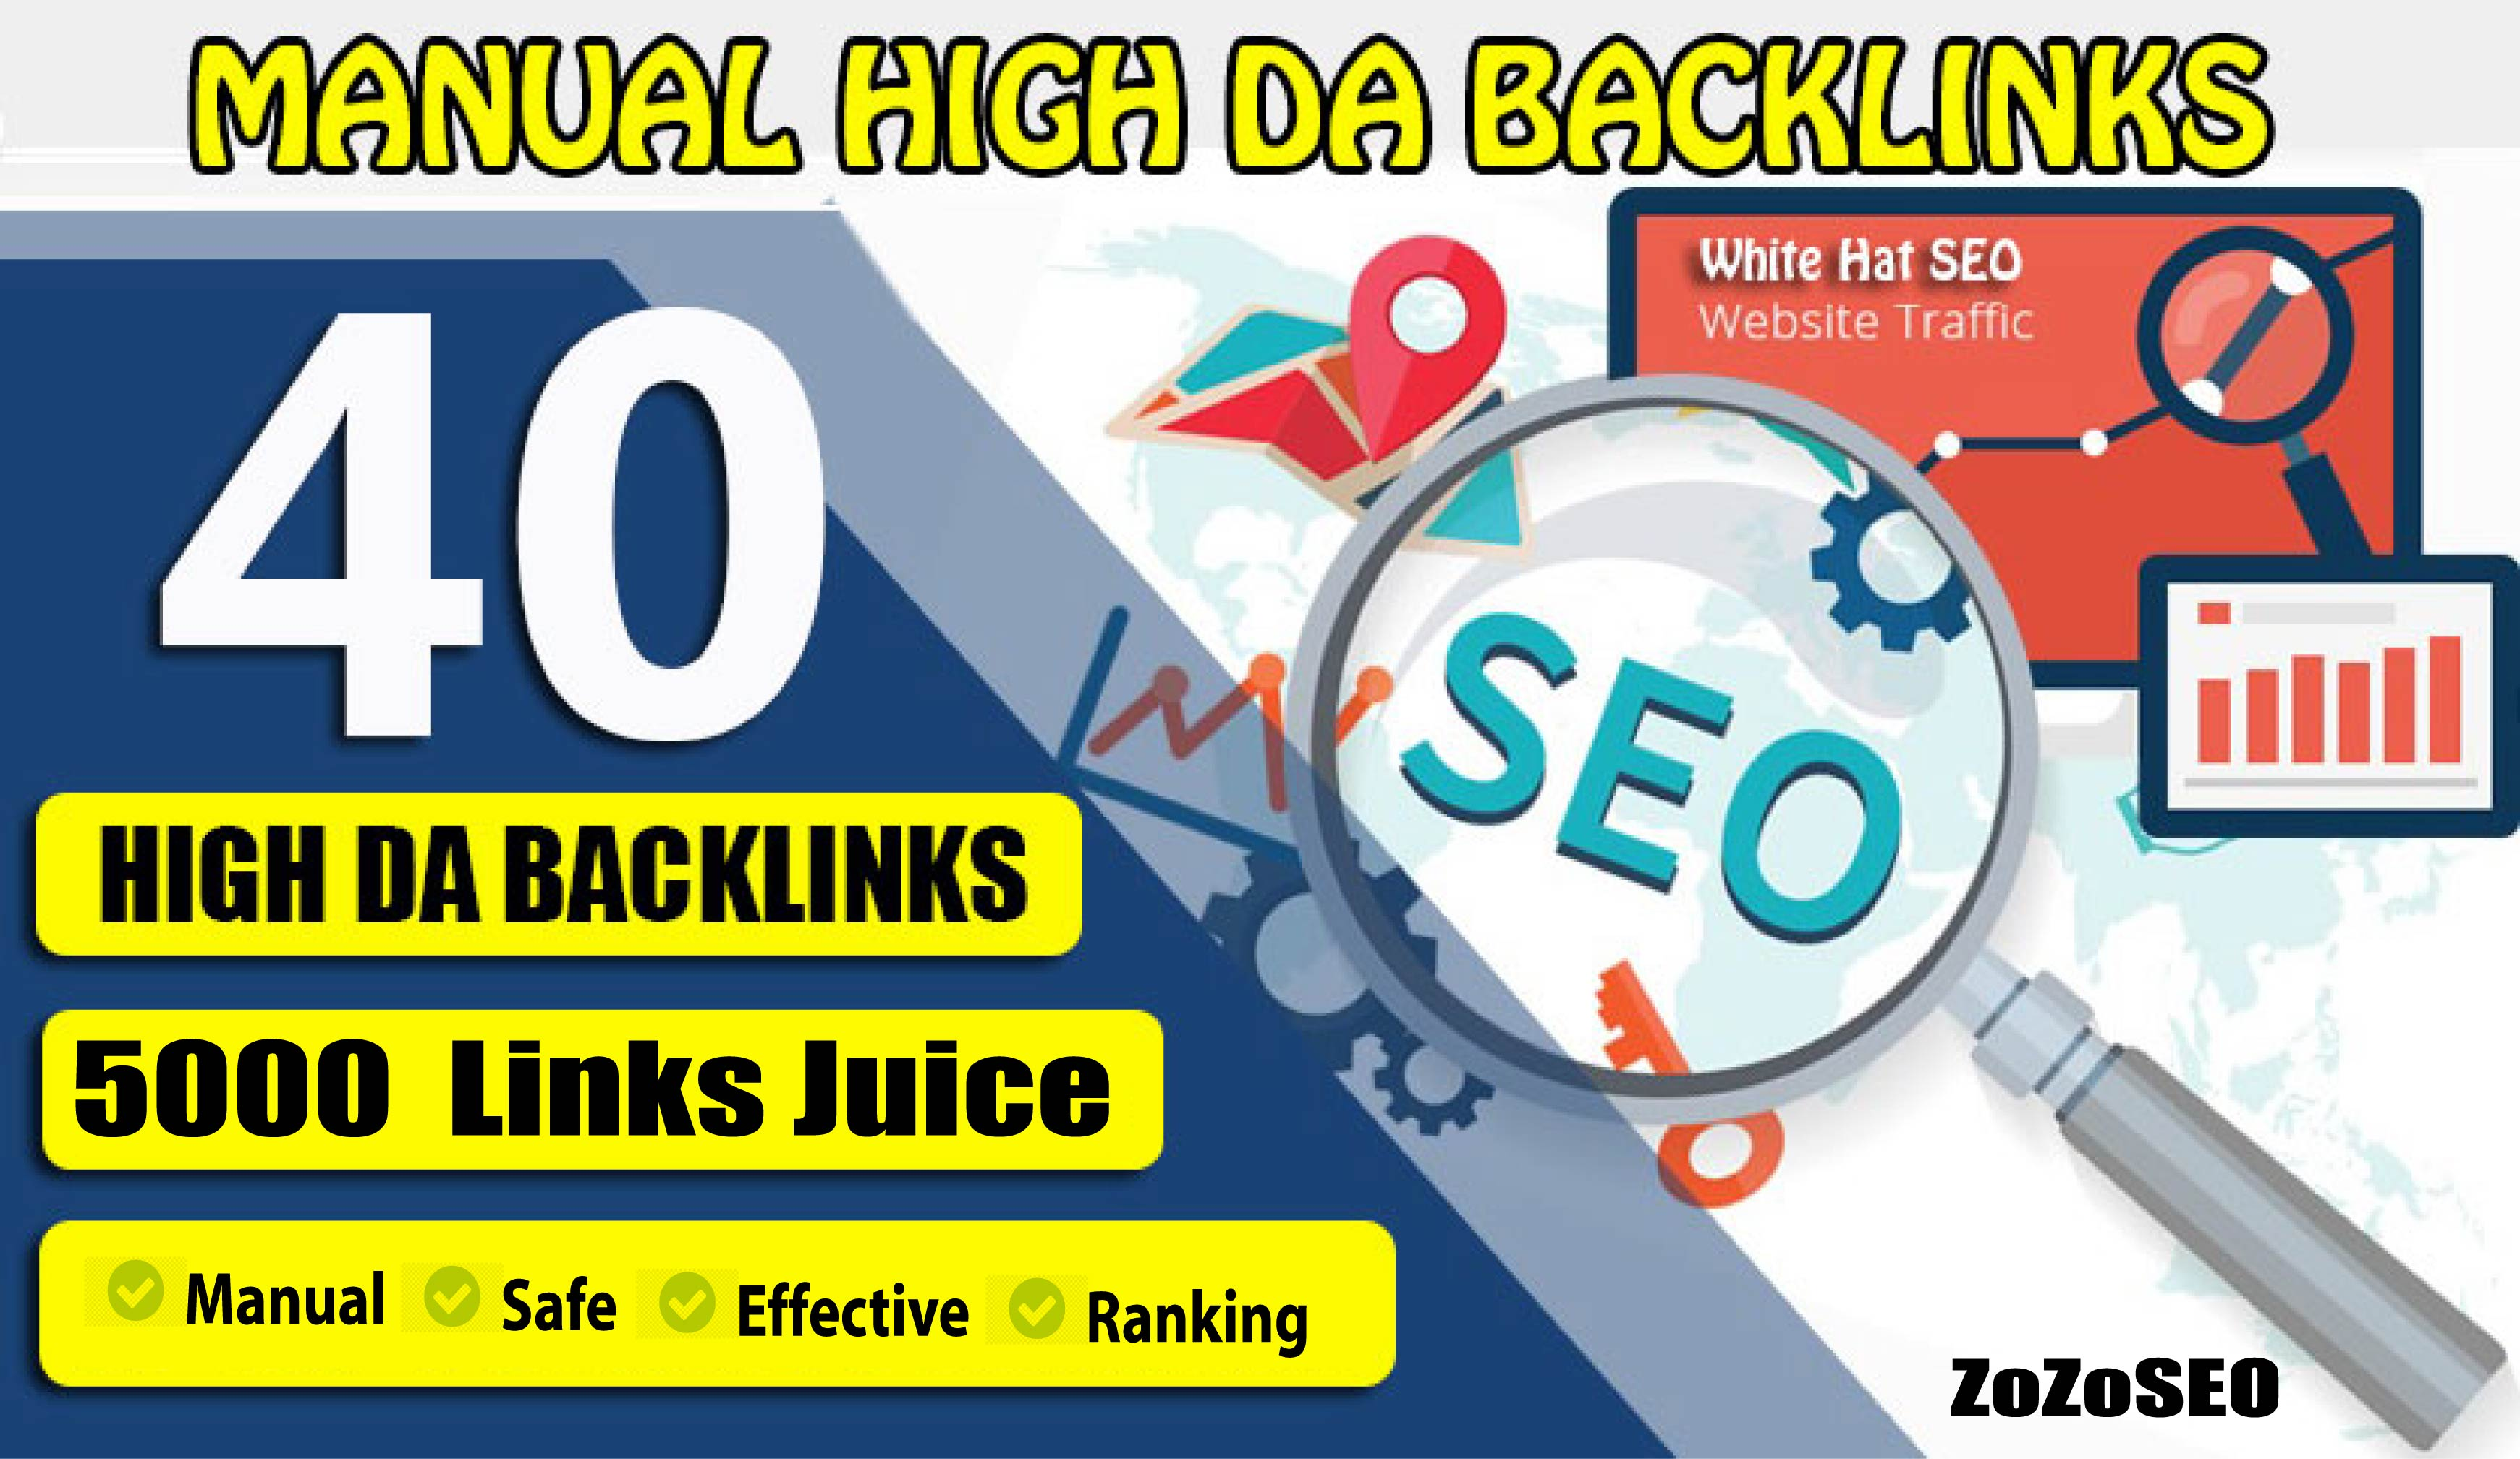 Create 40 Backlinks DA 100 Backlinks with 5000 Easy Link Juice And Blast